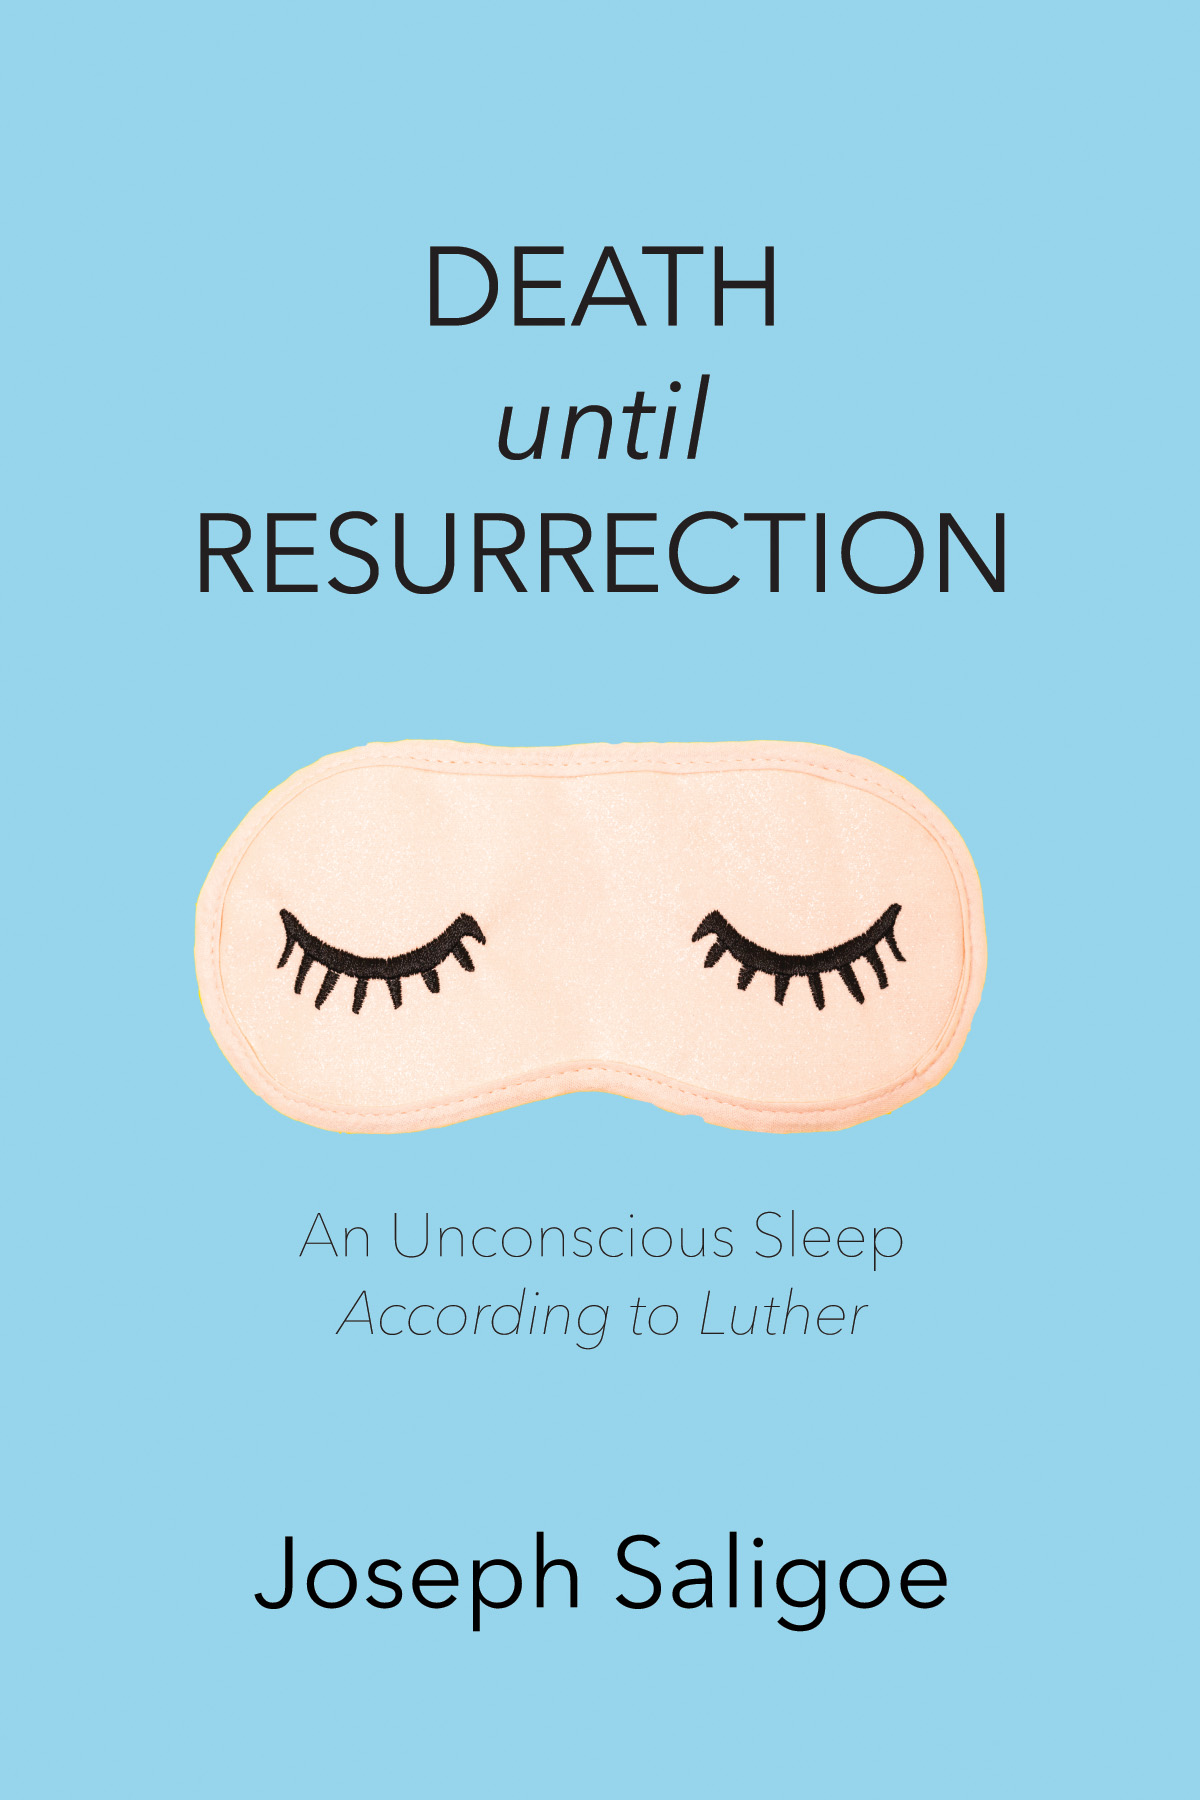 Death until Resurrection: An Unconscious Sleep According to Luther by Joseph Saligoe (Wipf & Stock, Oregon, 2020) by Joseph Saligoe